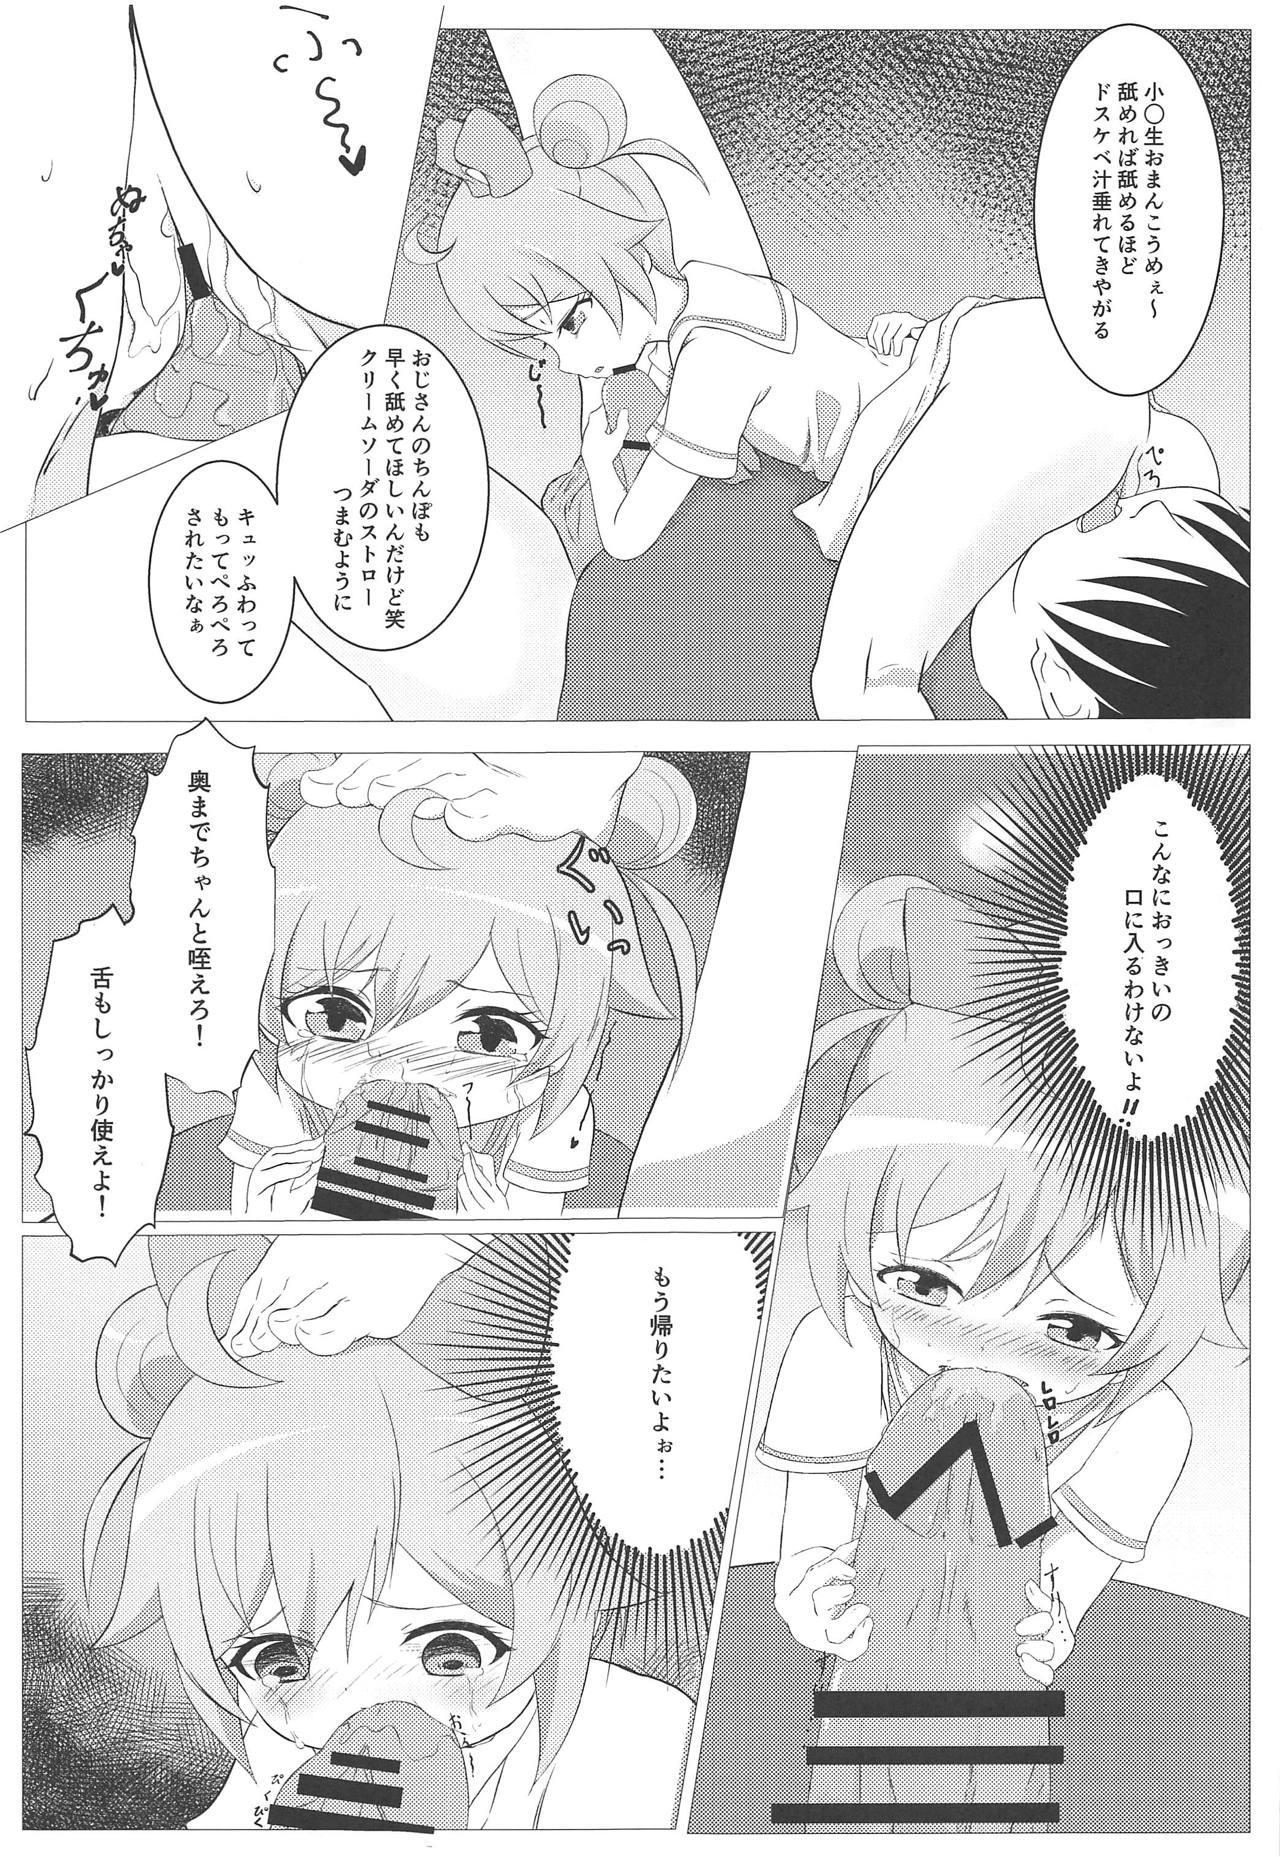 Kami Idol Rachitte Mita! 3